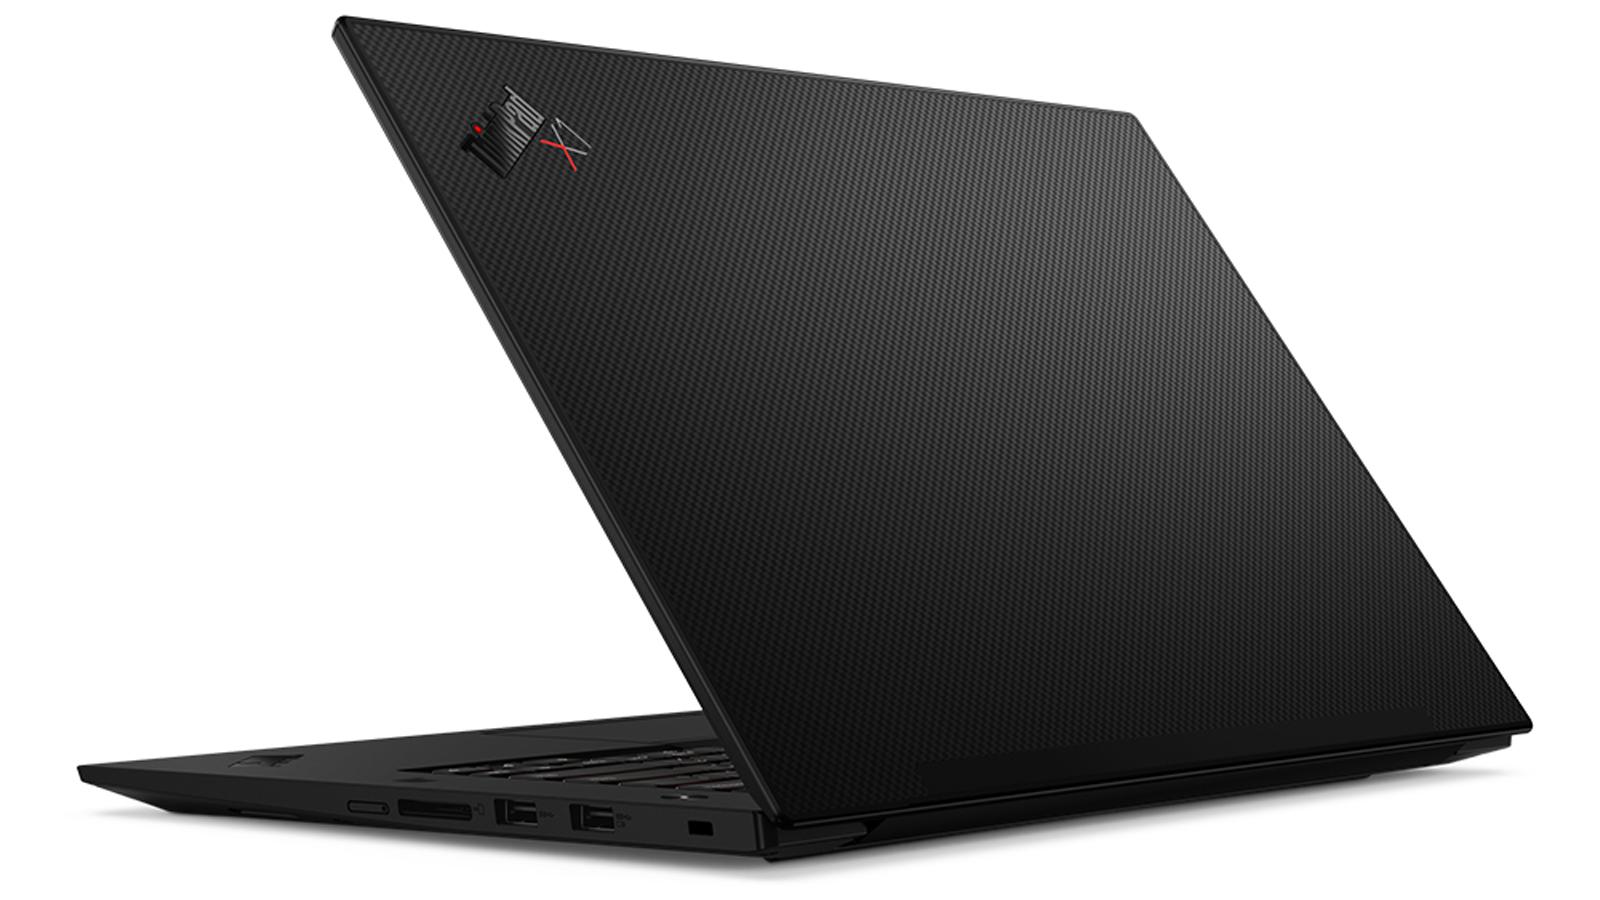 Lenovo ThinkPad X1 Extreme Gen 3 carbon fiber lid